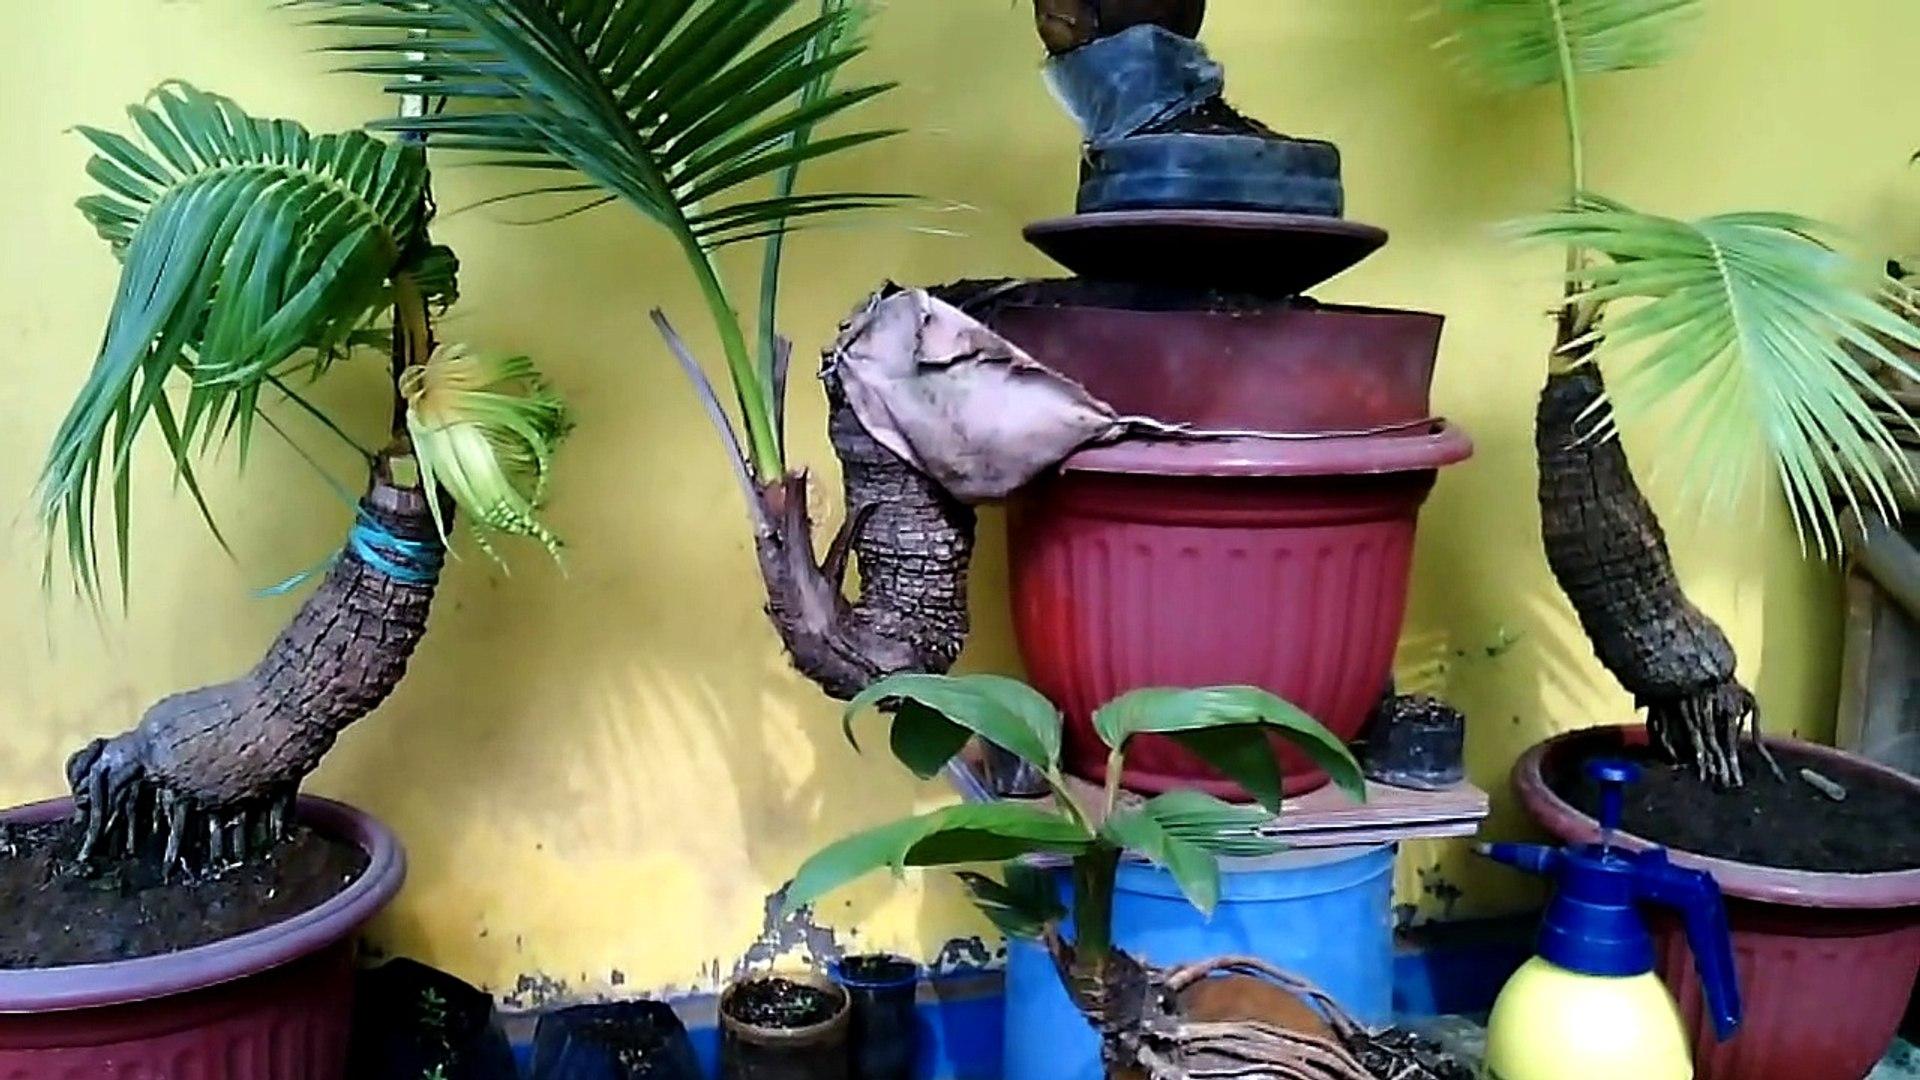 Bonsai Kelapa 30thn Paling Unik Coconut Bonsai Video Dailymotion